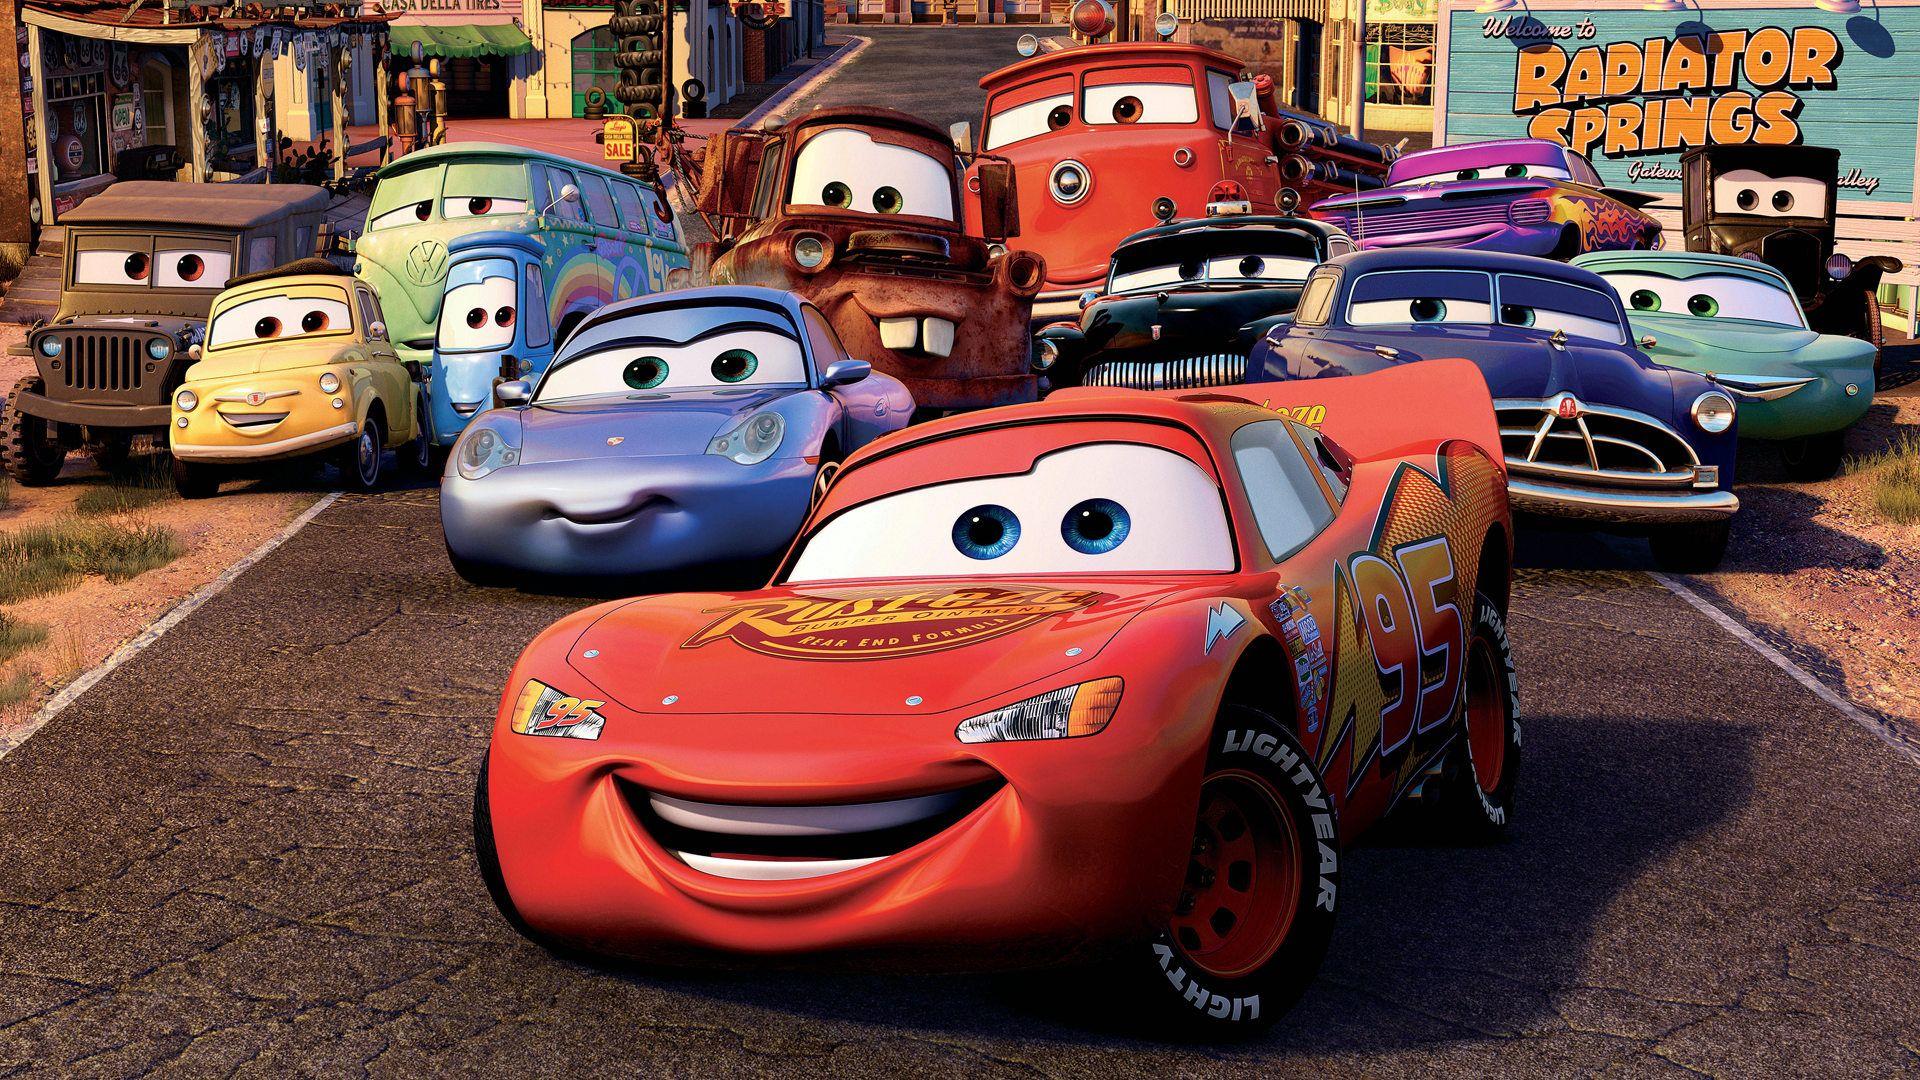 Cars The Movie Wallpaper Hd 4020 Full Hd Wallpaper Desktop